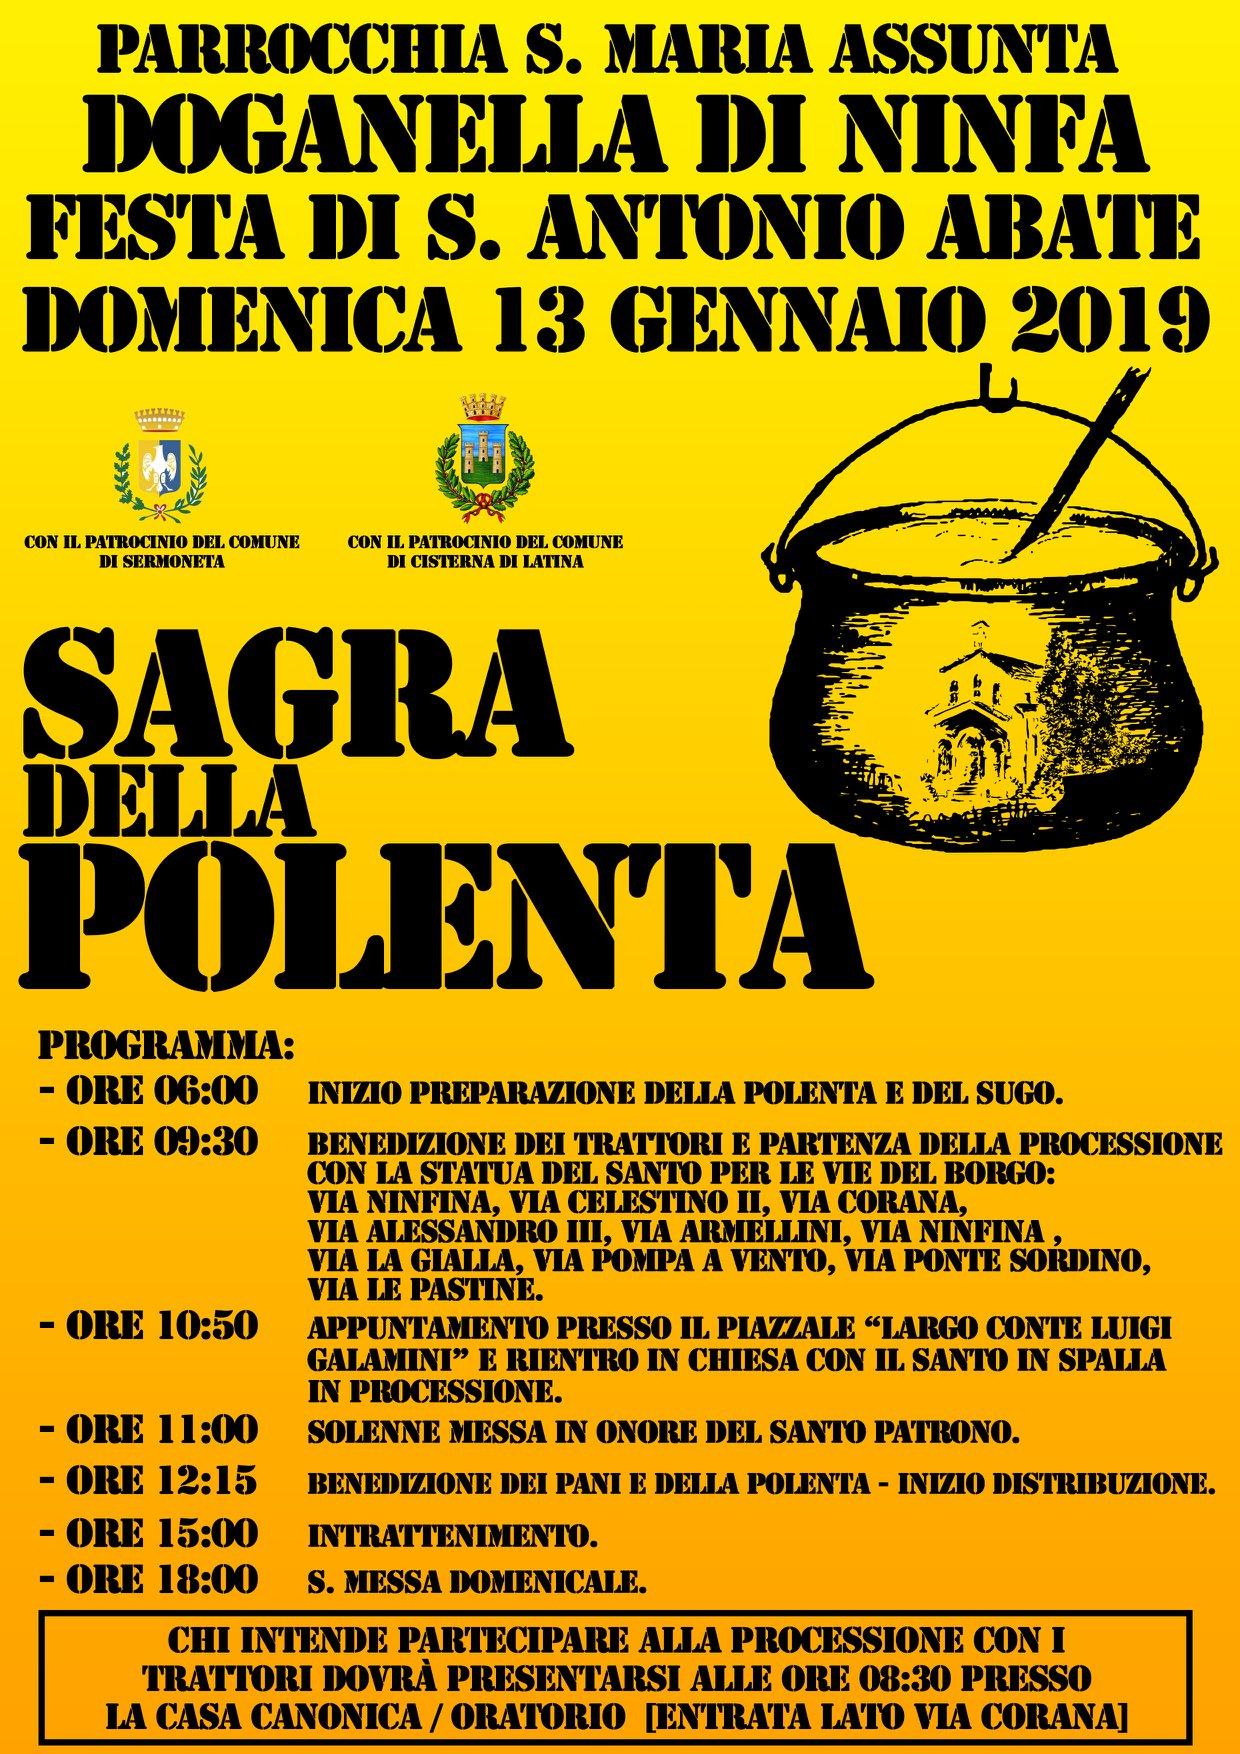 doganella-ninfa-sagra-polenta